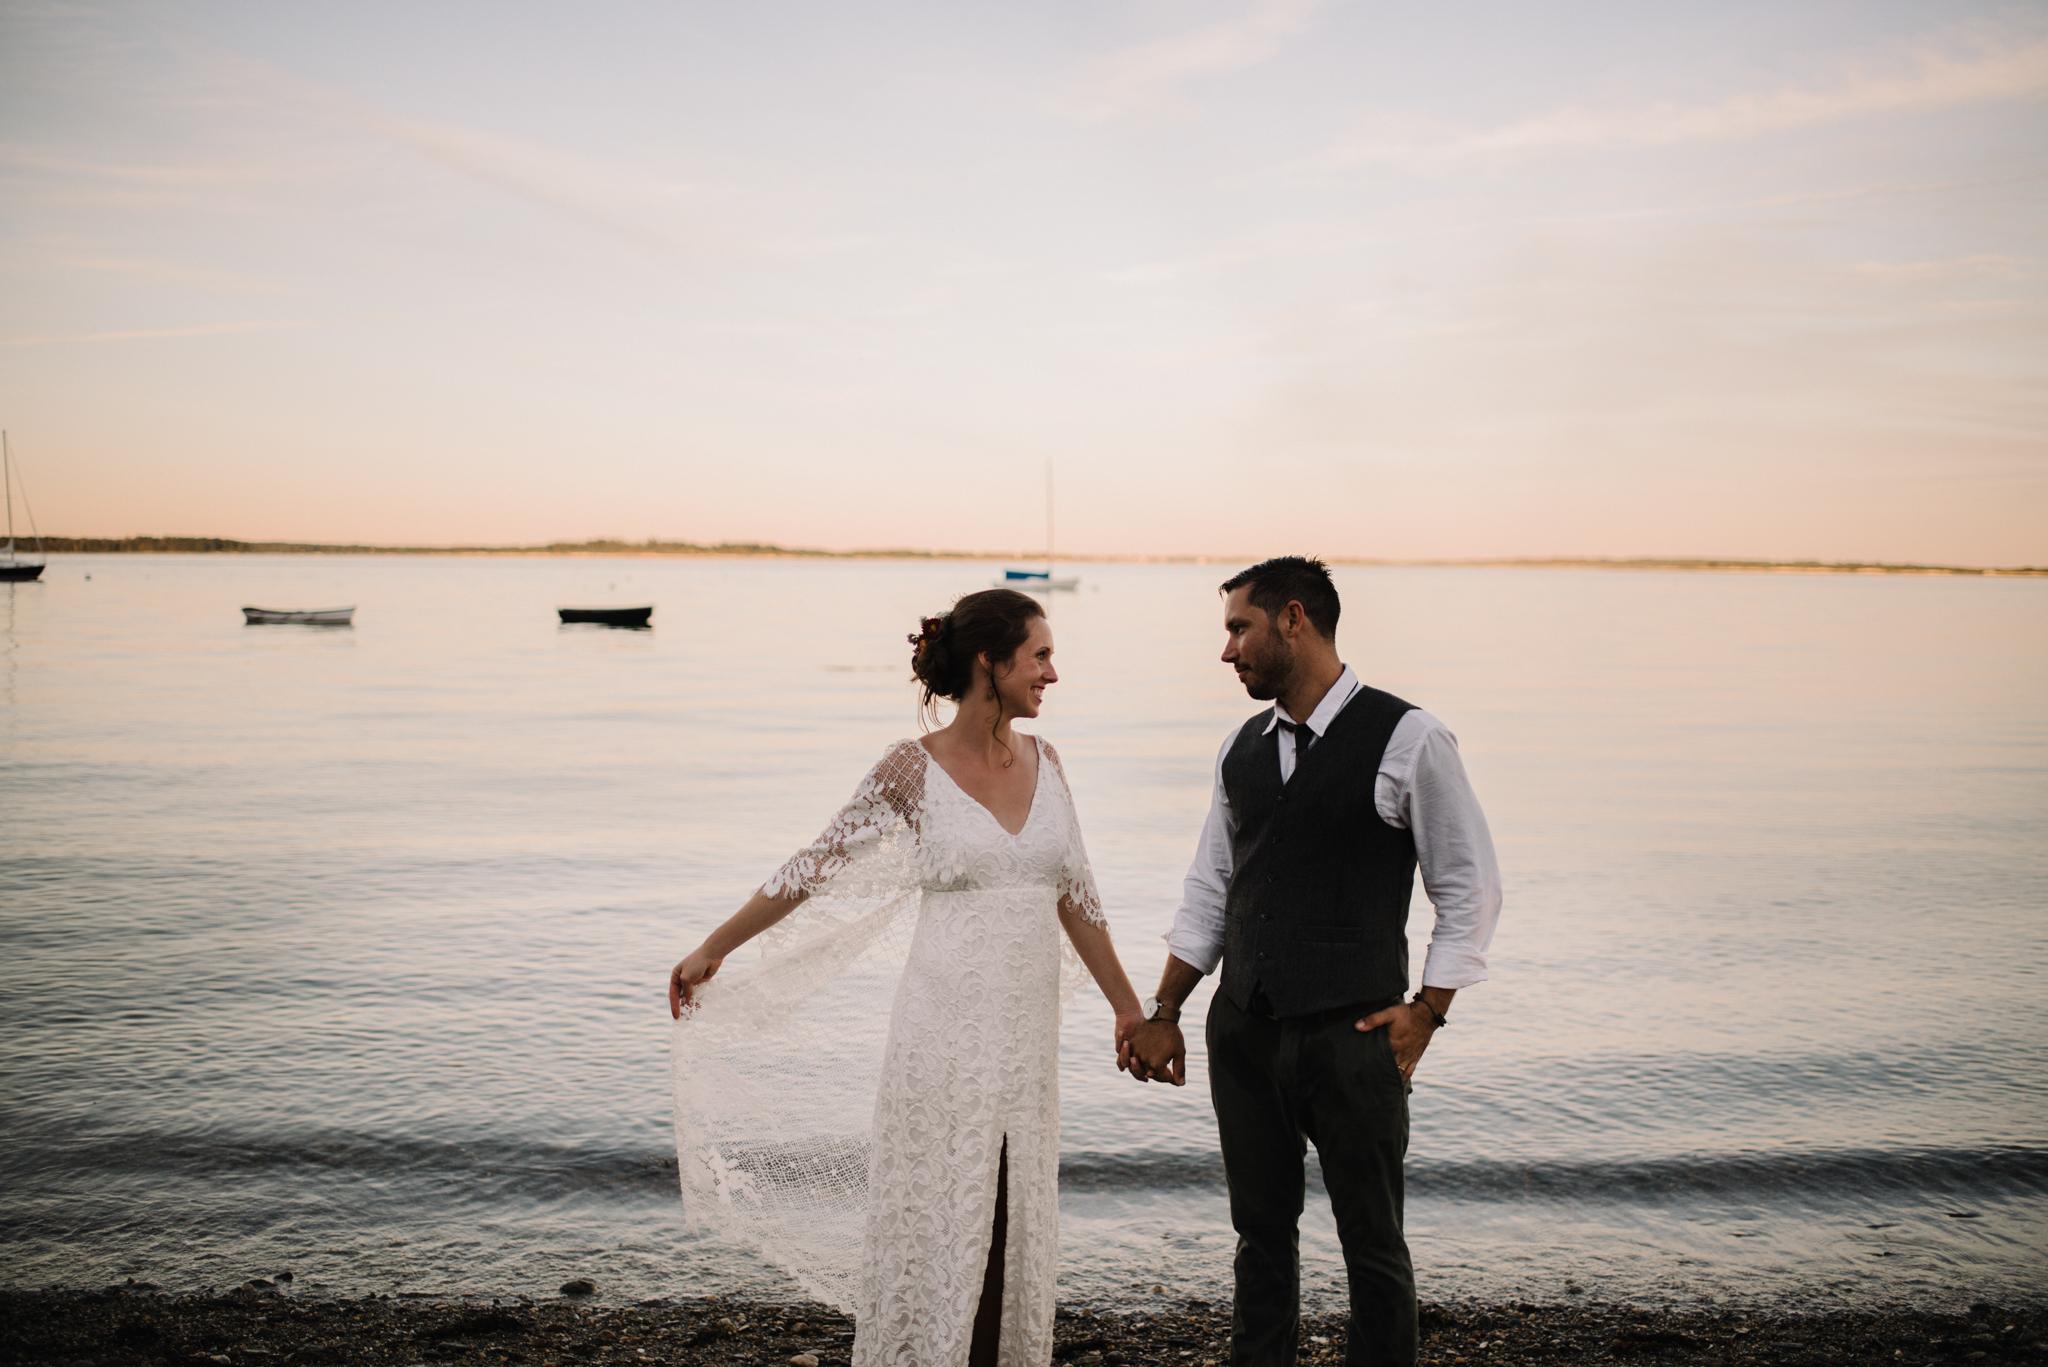 Damian and Jesse Chebeague Island Maine Backyard Destination Beach Wedding White Sails Creative_23.JPG